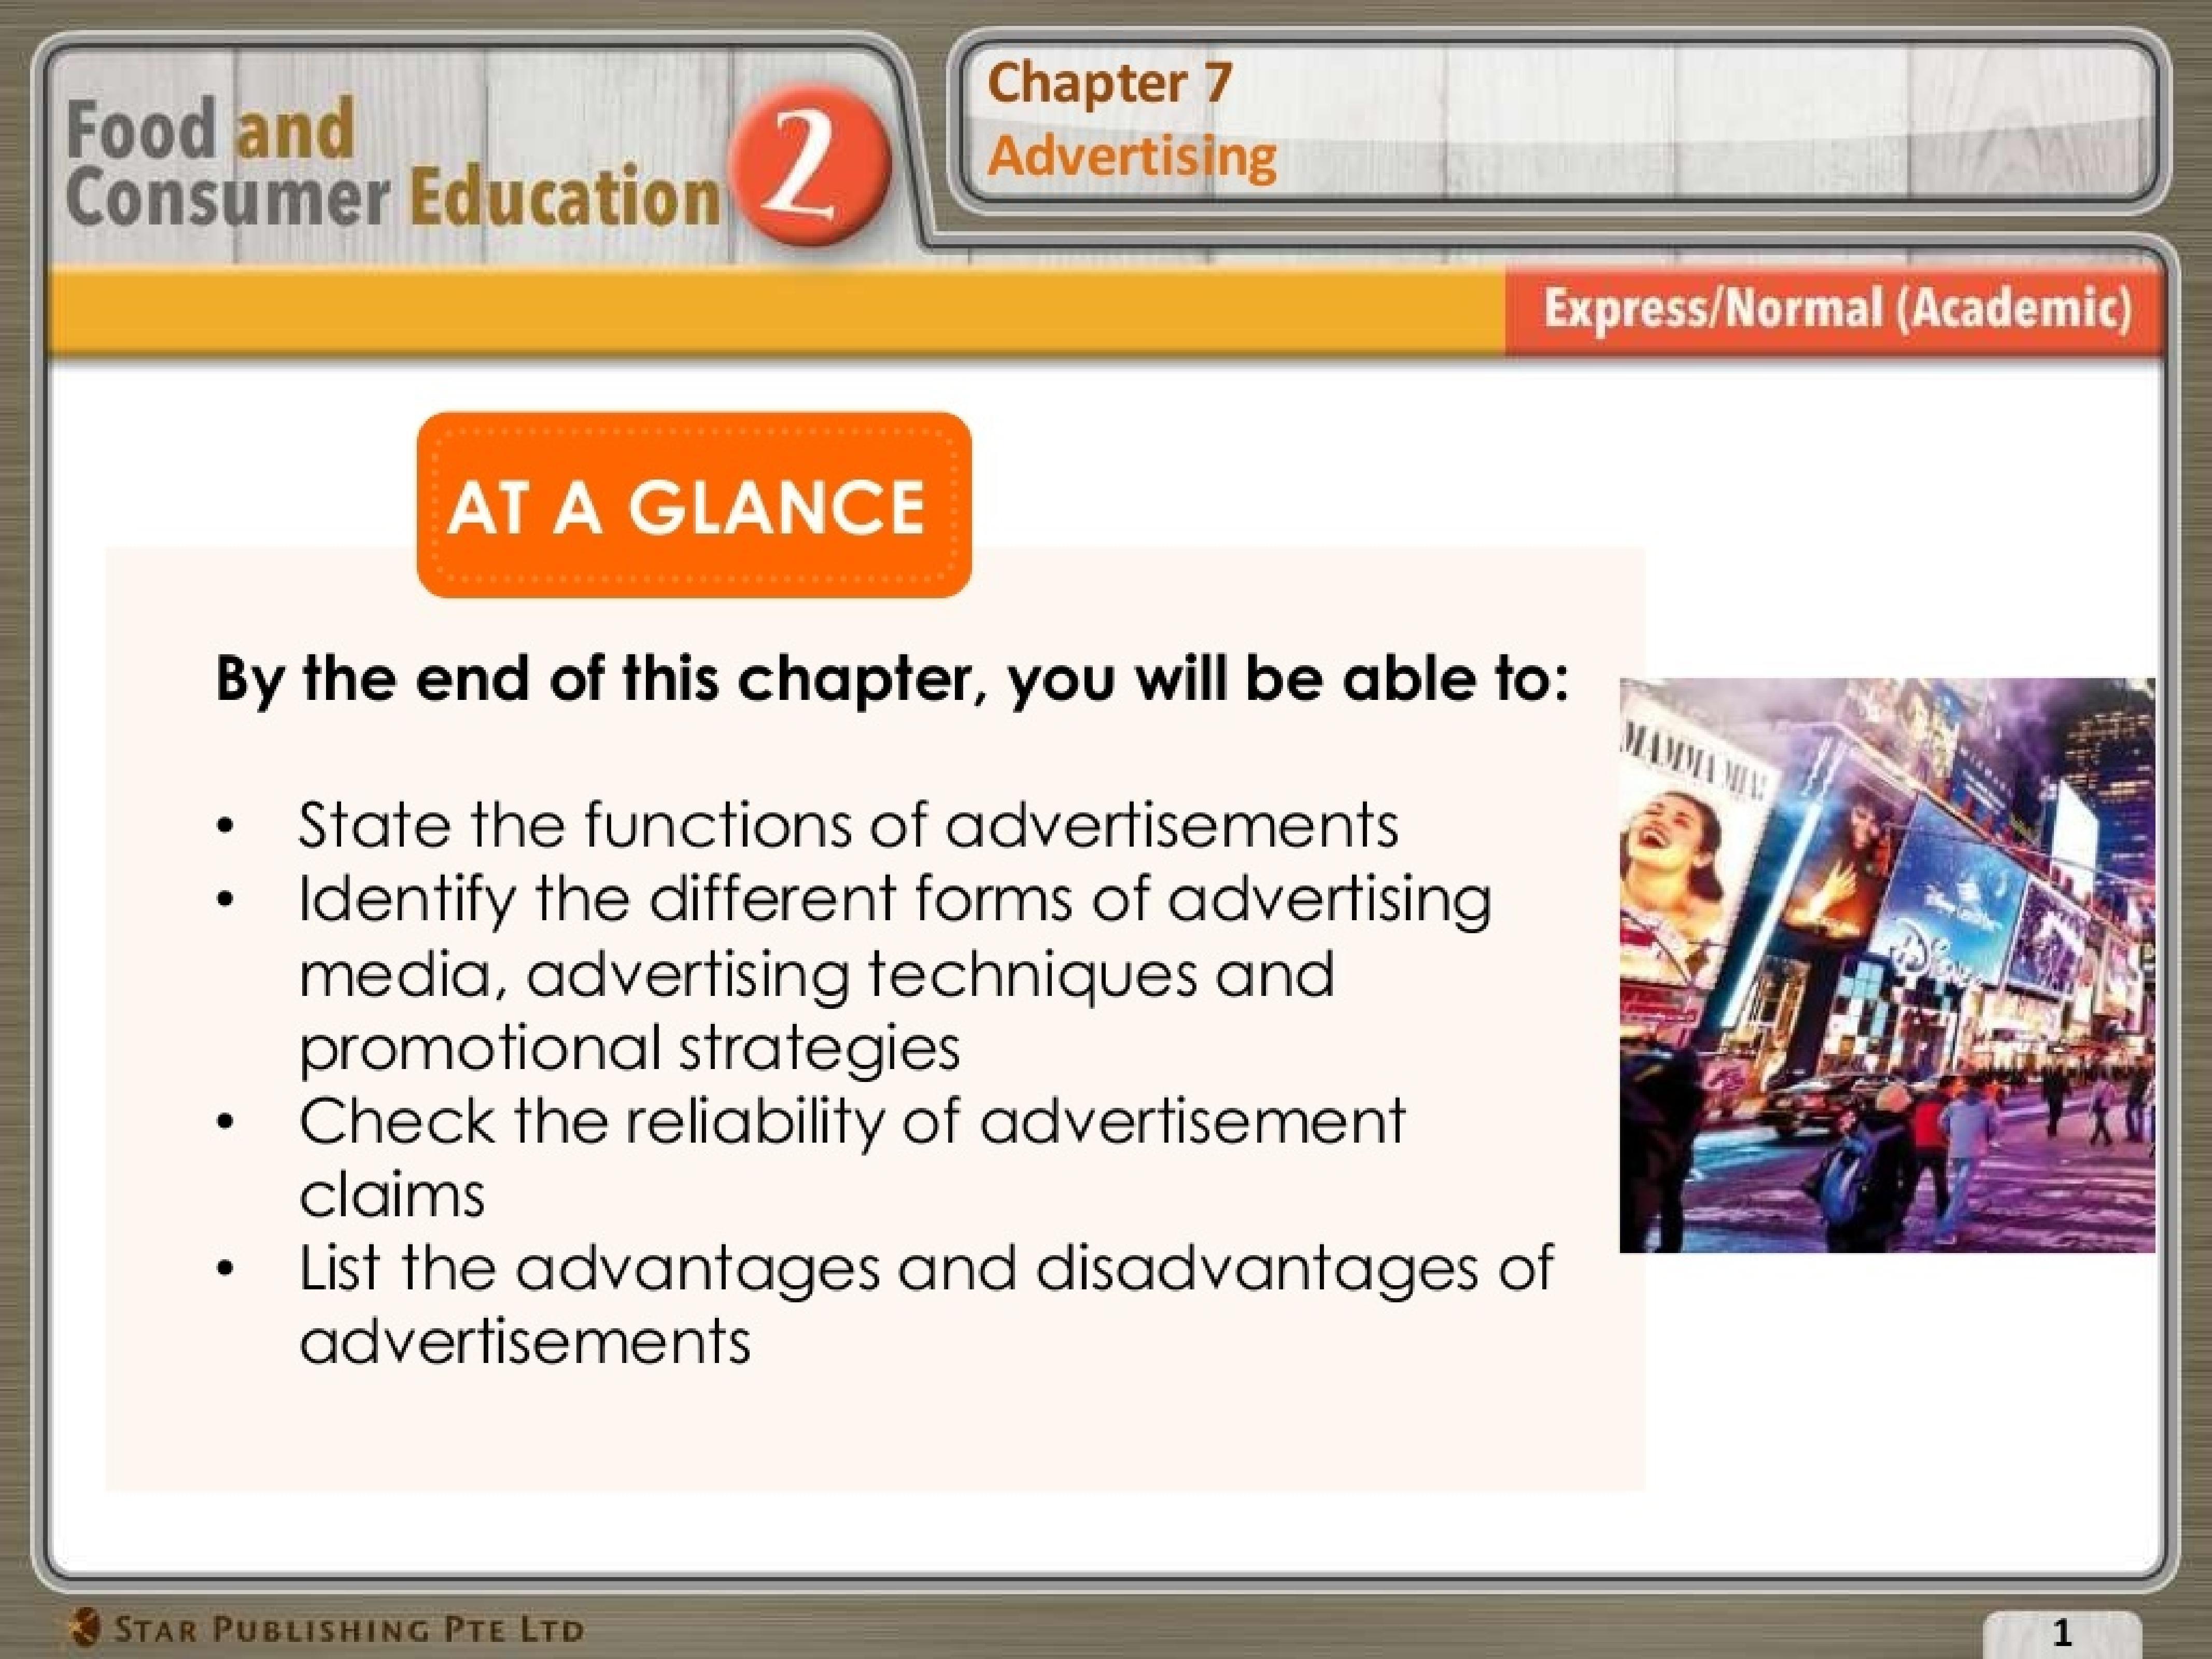 (Sec 2 FCE) Advertising